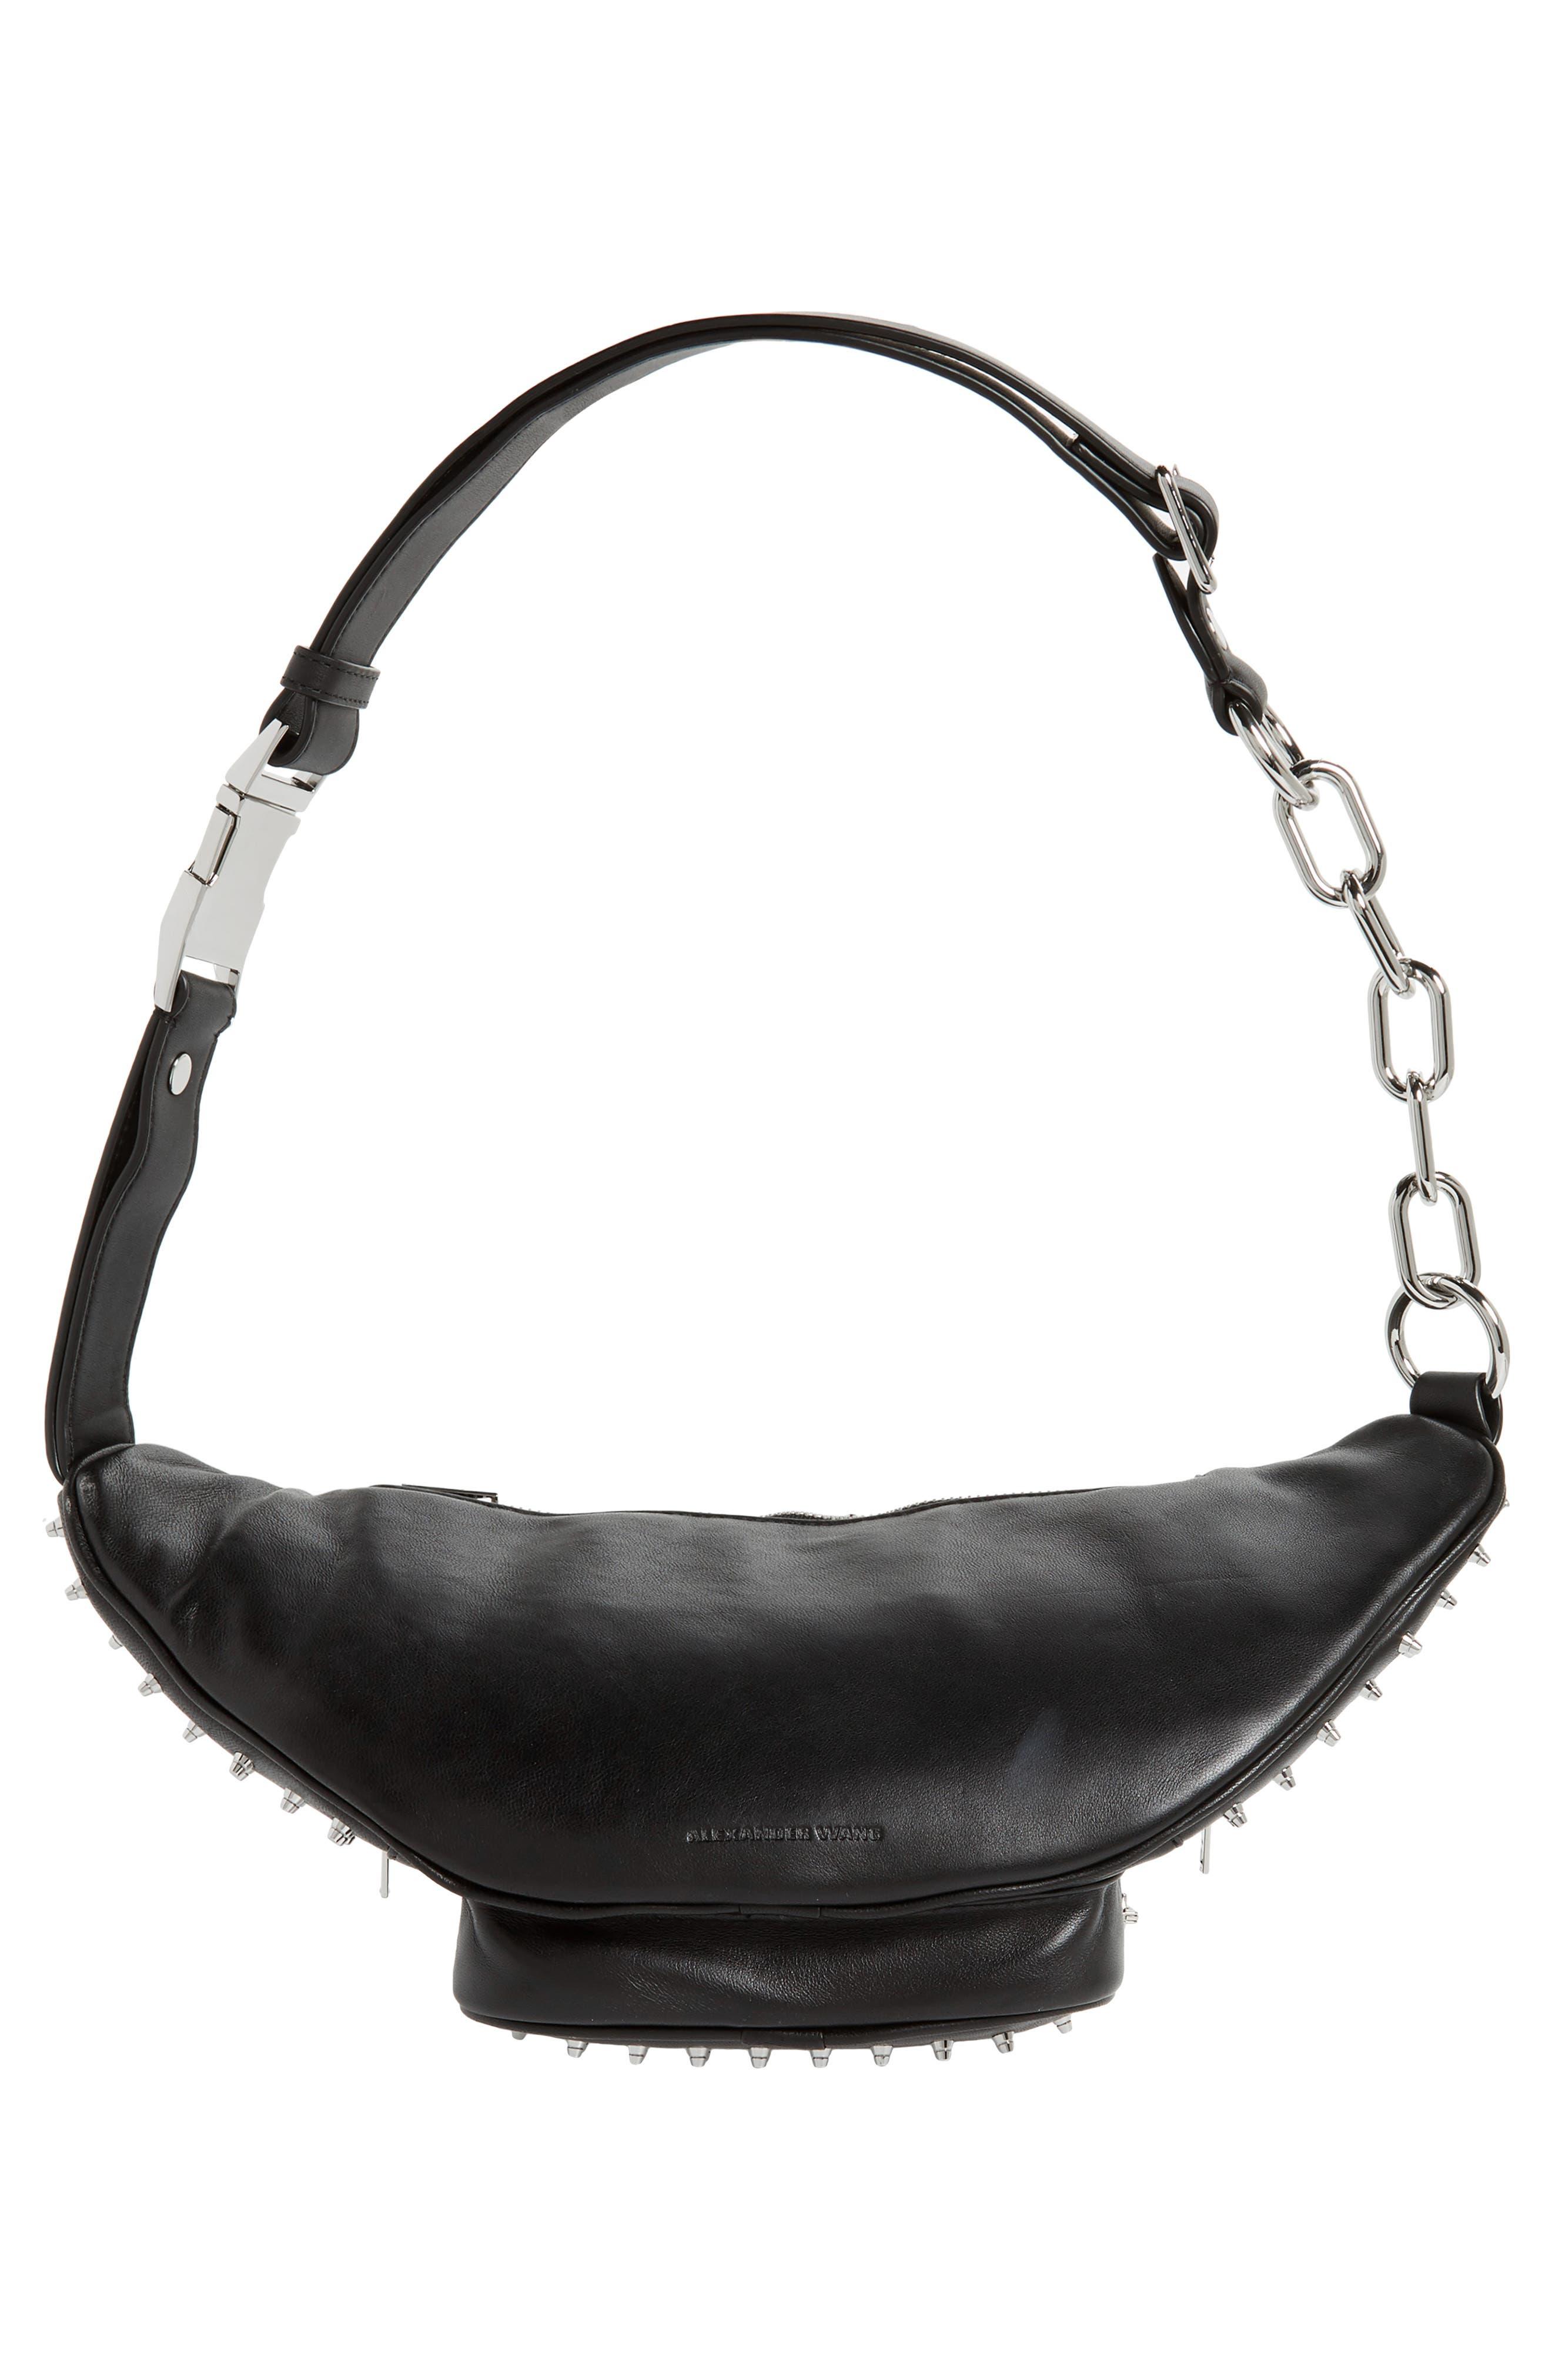 Attica Studded Lambskin Leather Fanny Pack,                             Alternate thumbnail 7, color,                             BLACK